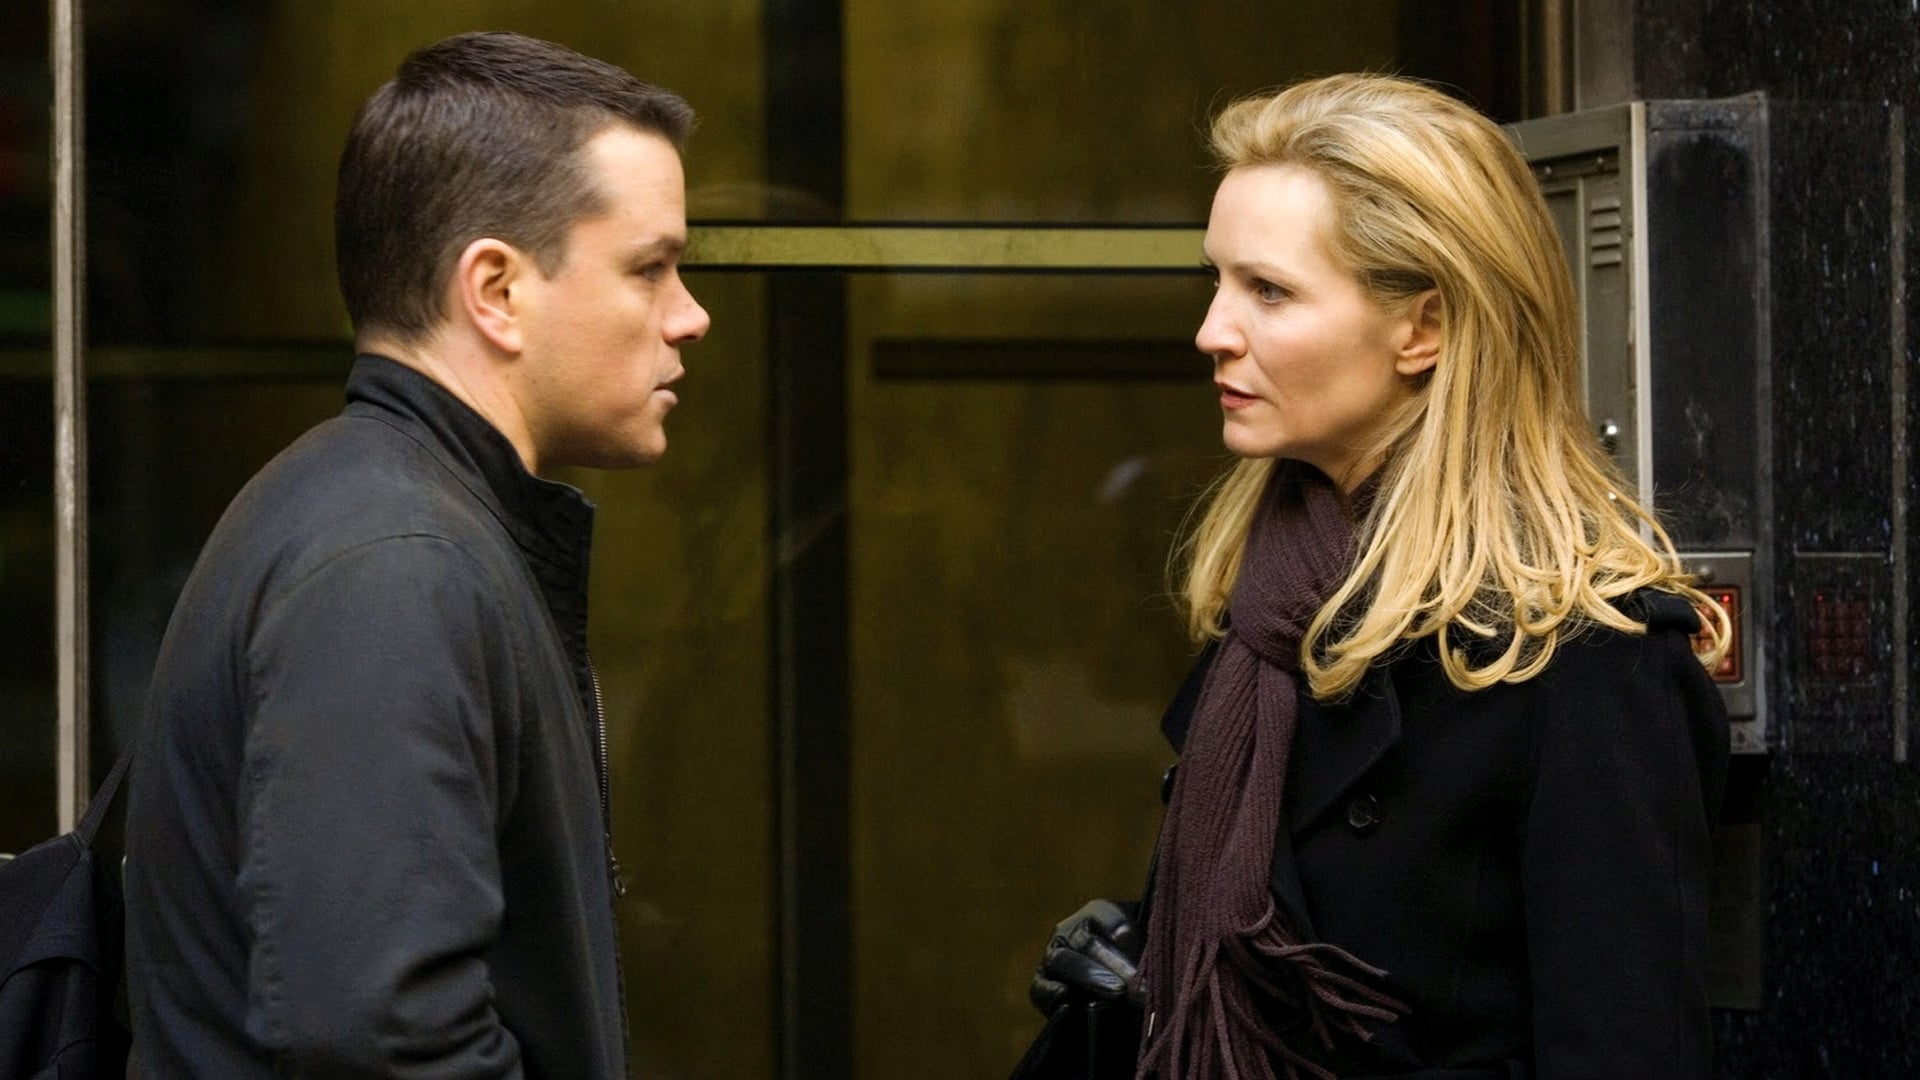 Watch The Bourne Ultimatum 2007 Movie Trailer